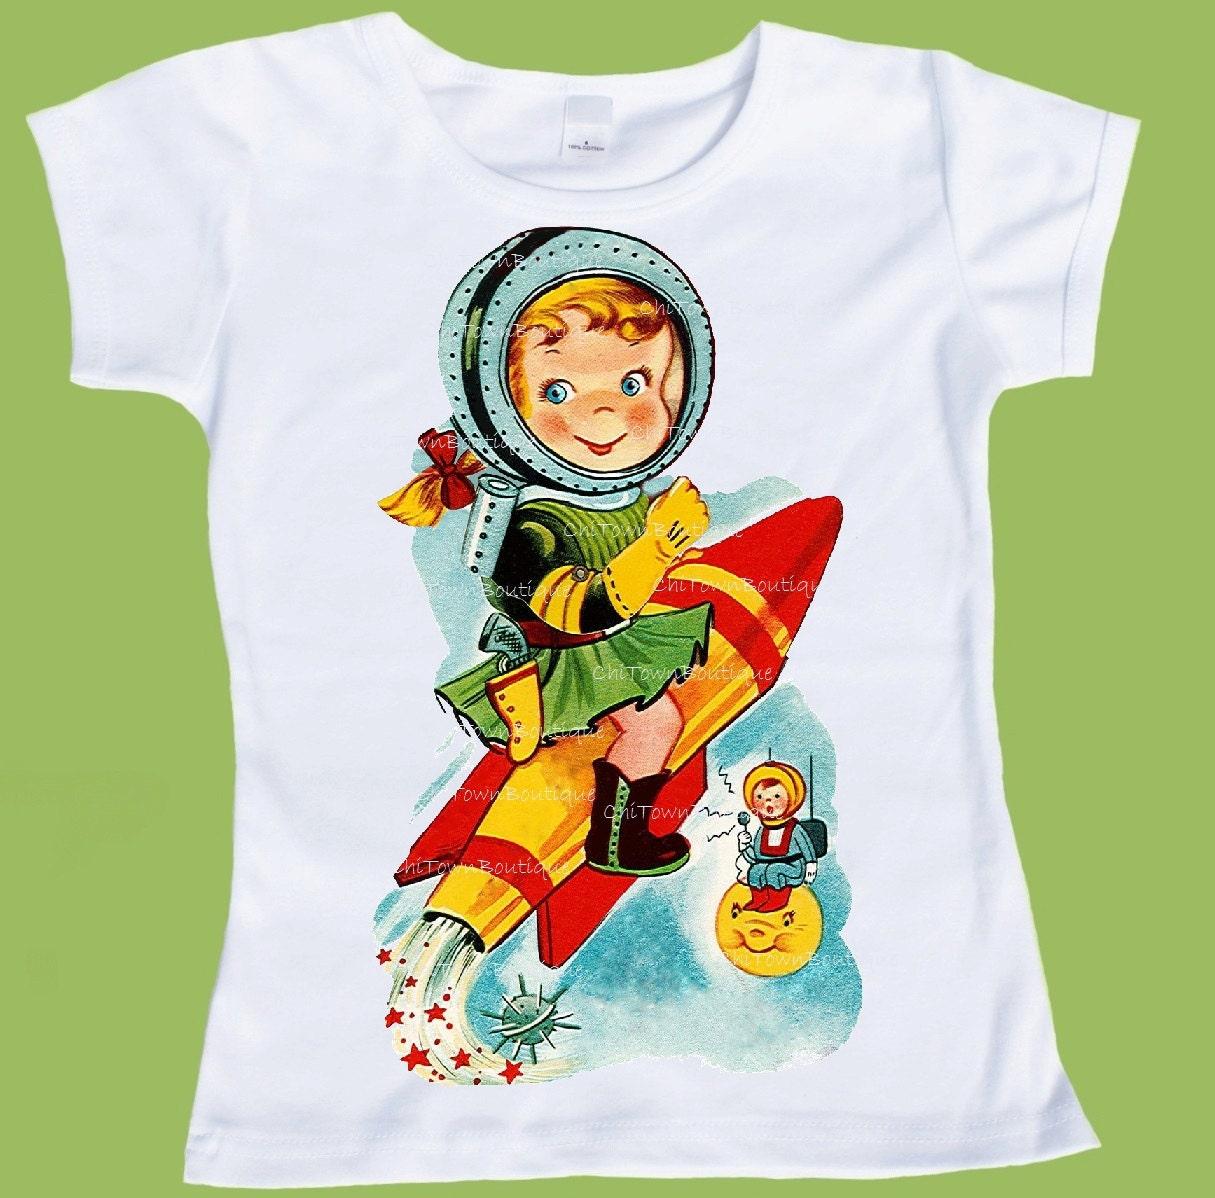 Retro Rocket Girl Space girl Astronaut Tee graphic